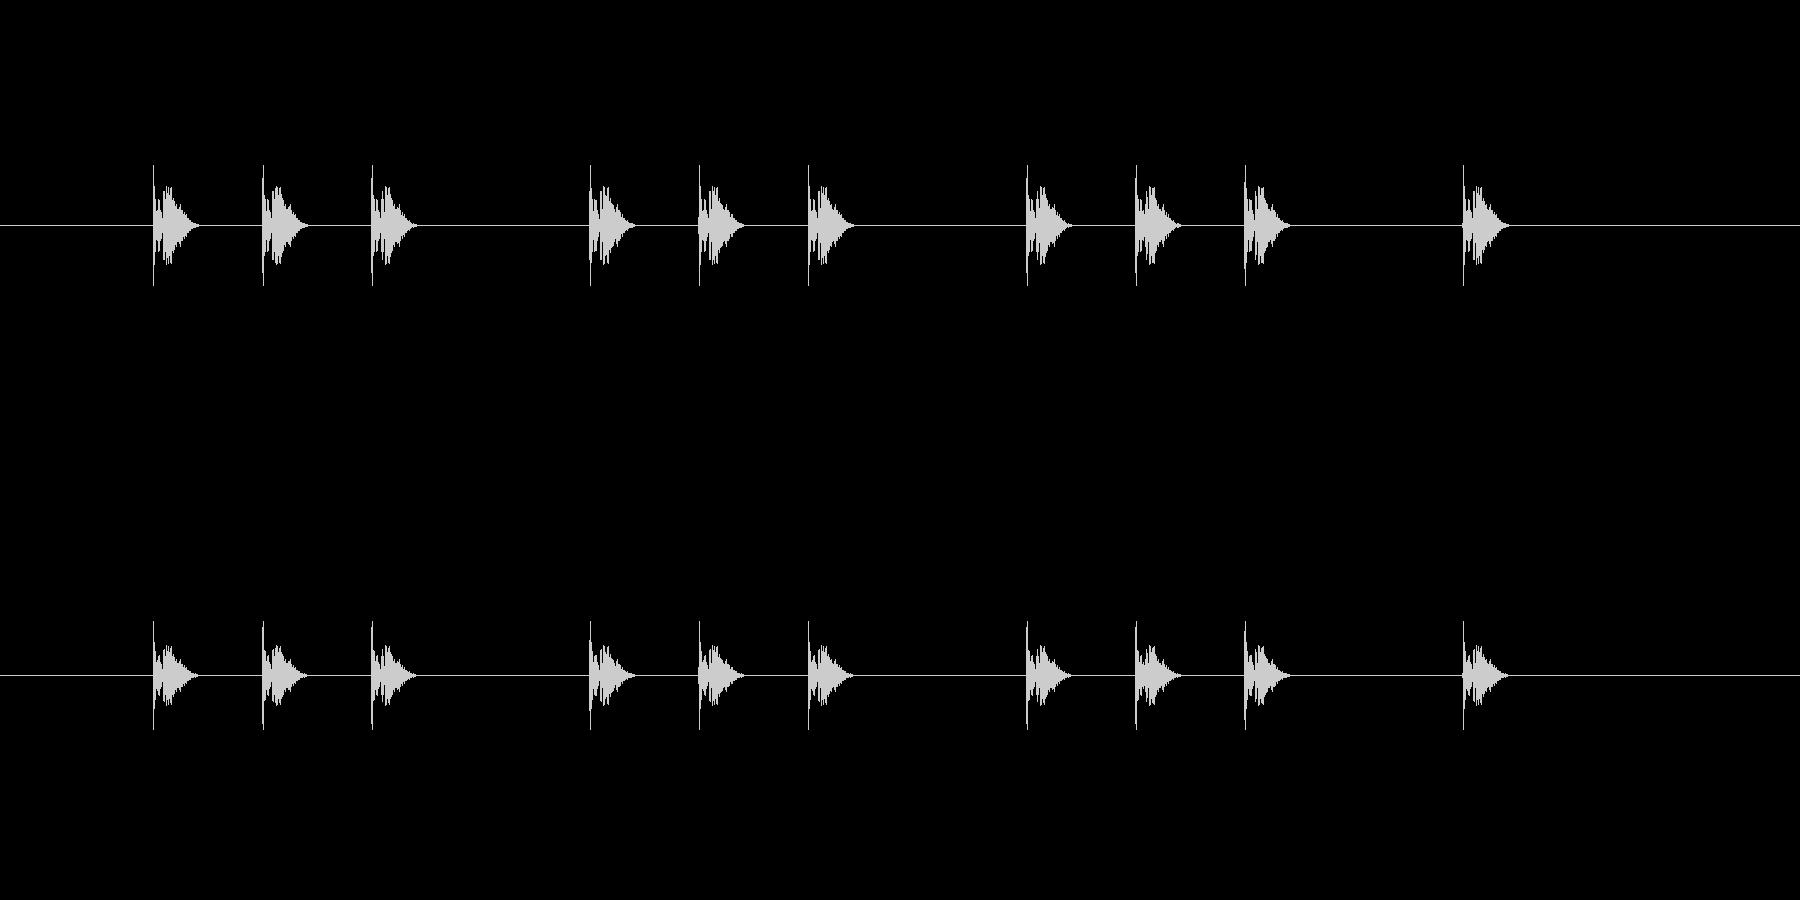 タタタン、タタタン、タタタン、タンの音の未再生の波形